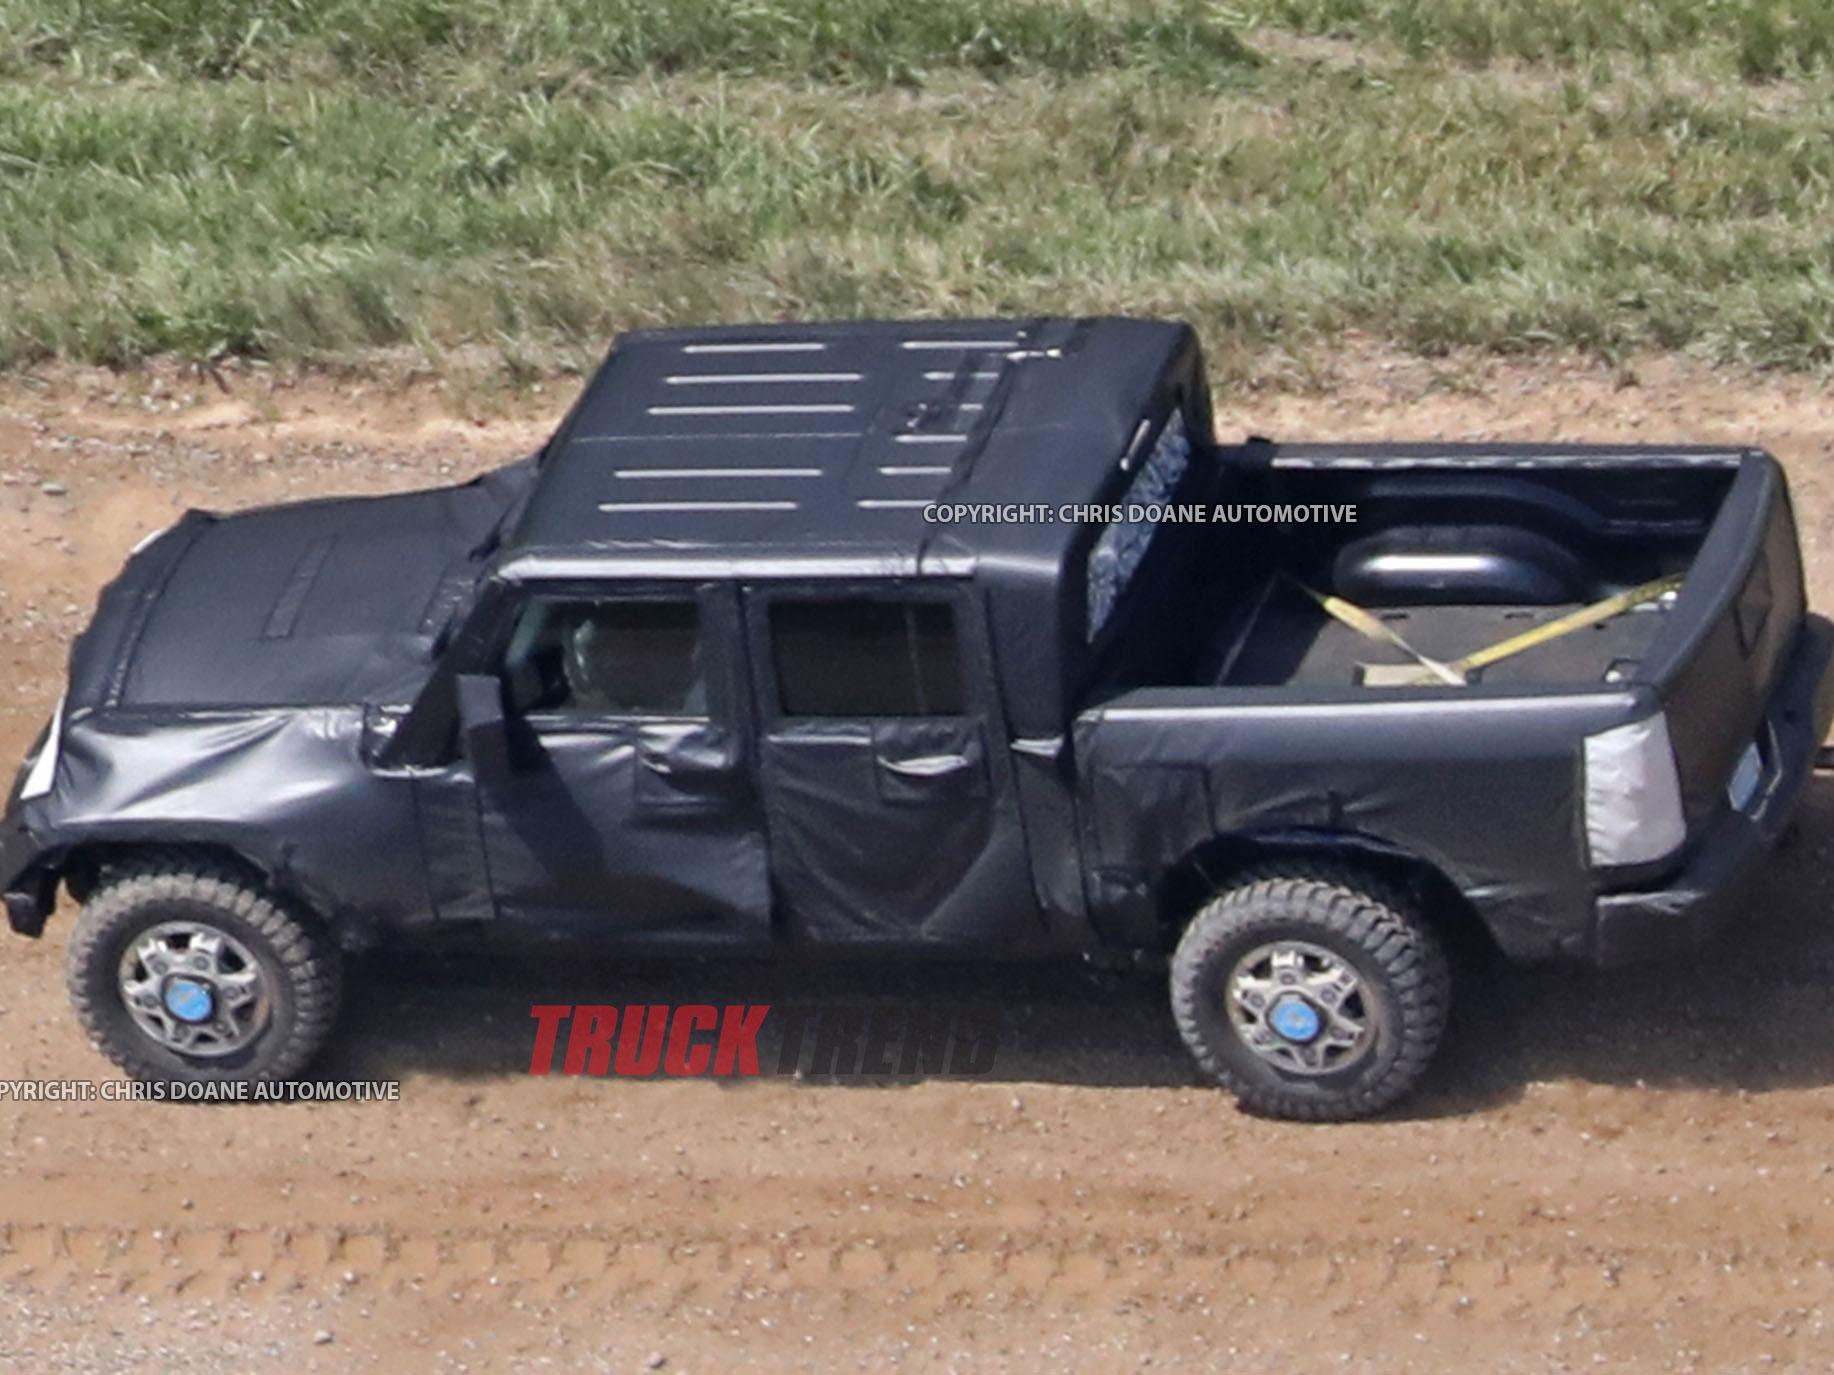 2019 Jeep Wrangler JL Pickup Spyshots 15